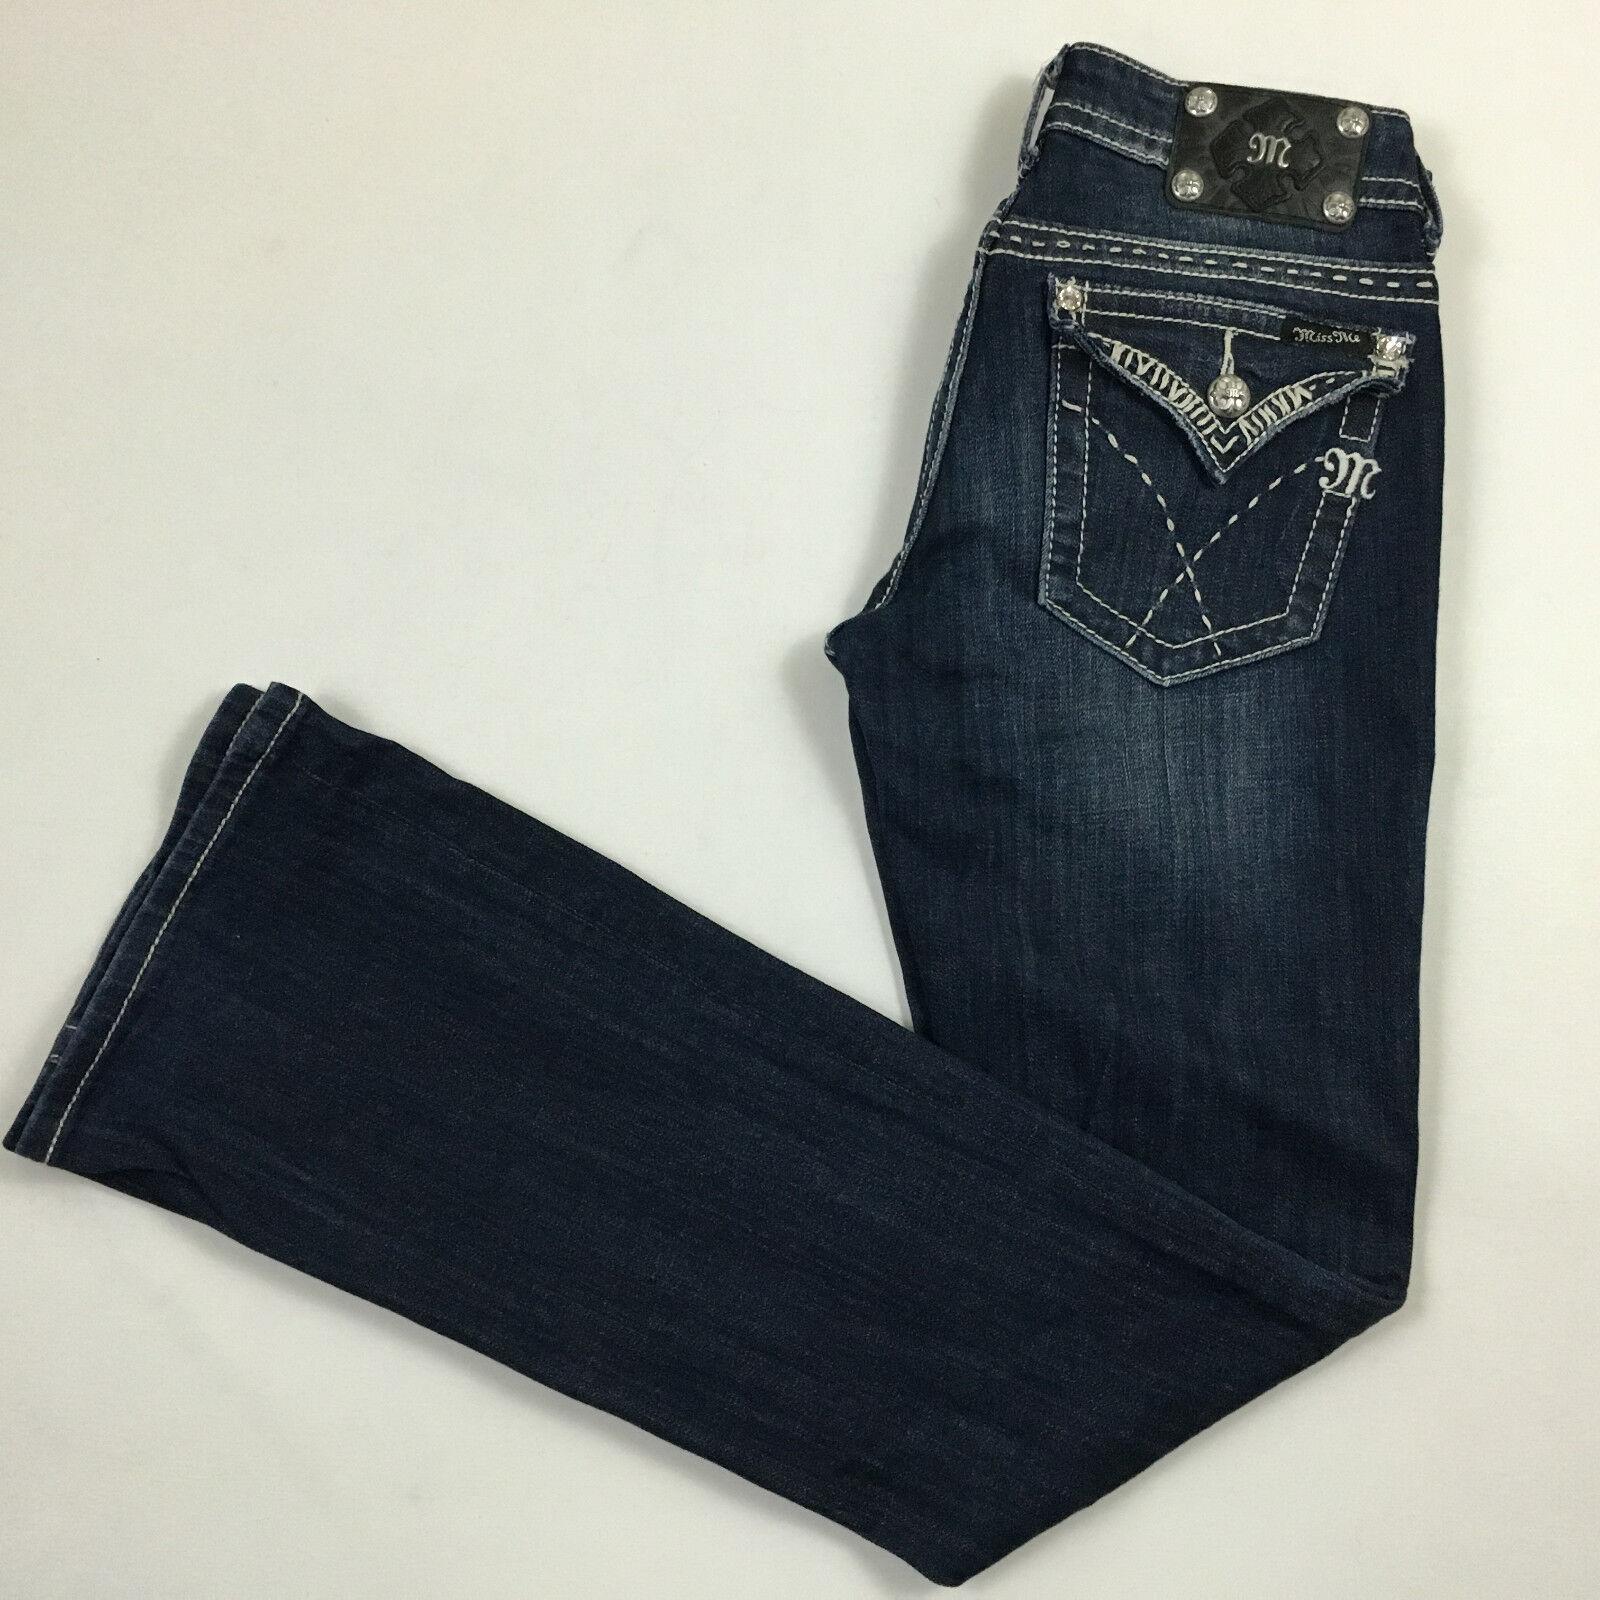 MISS ME womens 27x33 jeans BOOTCUT JW5180B faux diamonds whiskered dark bluee